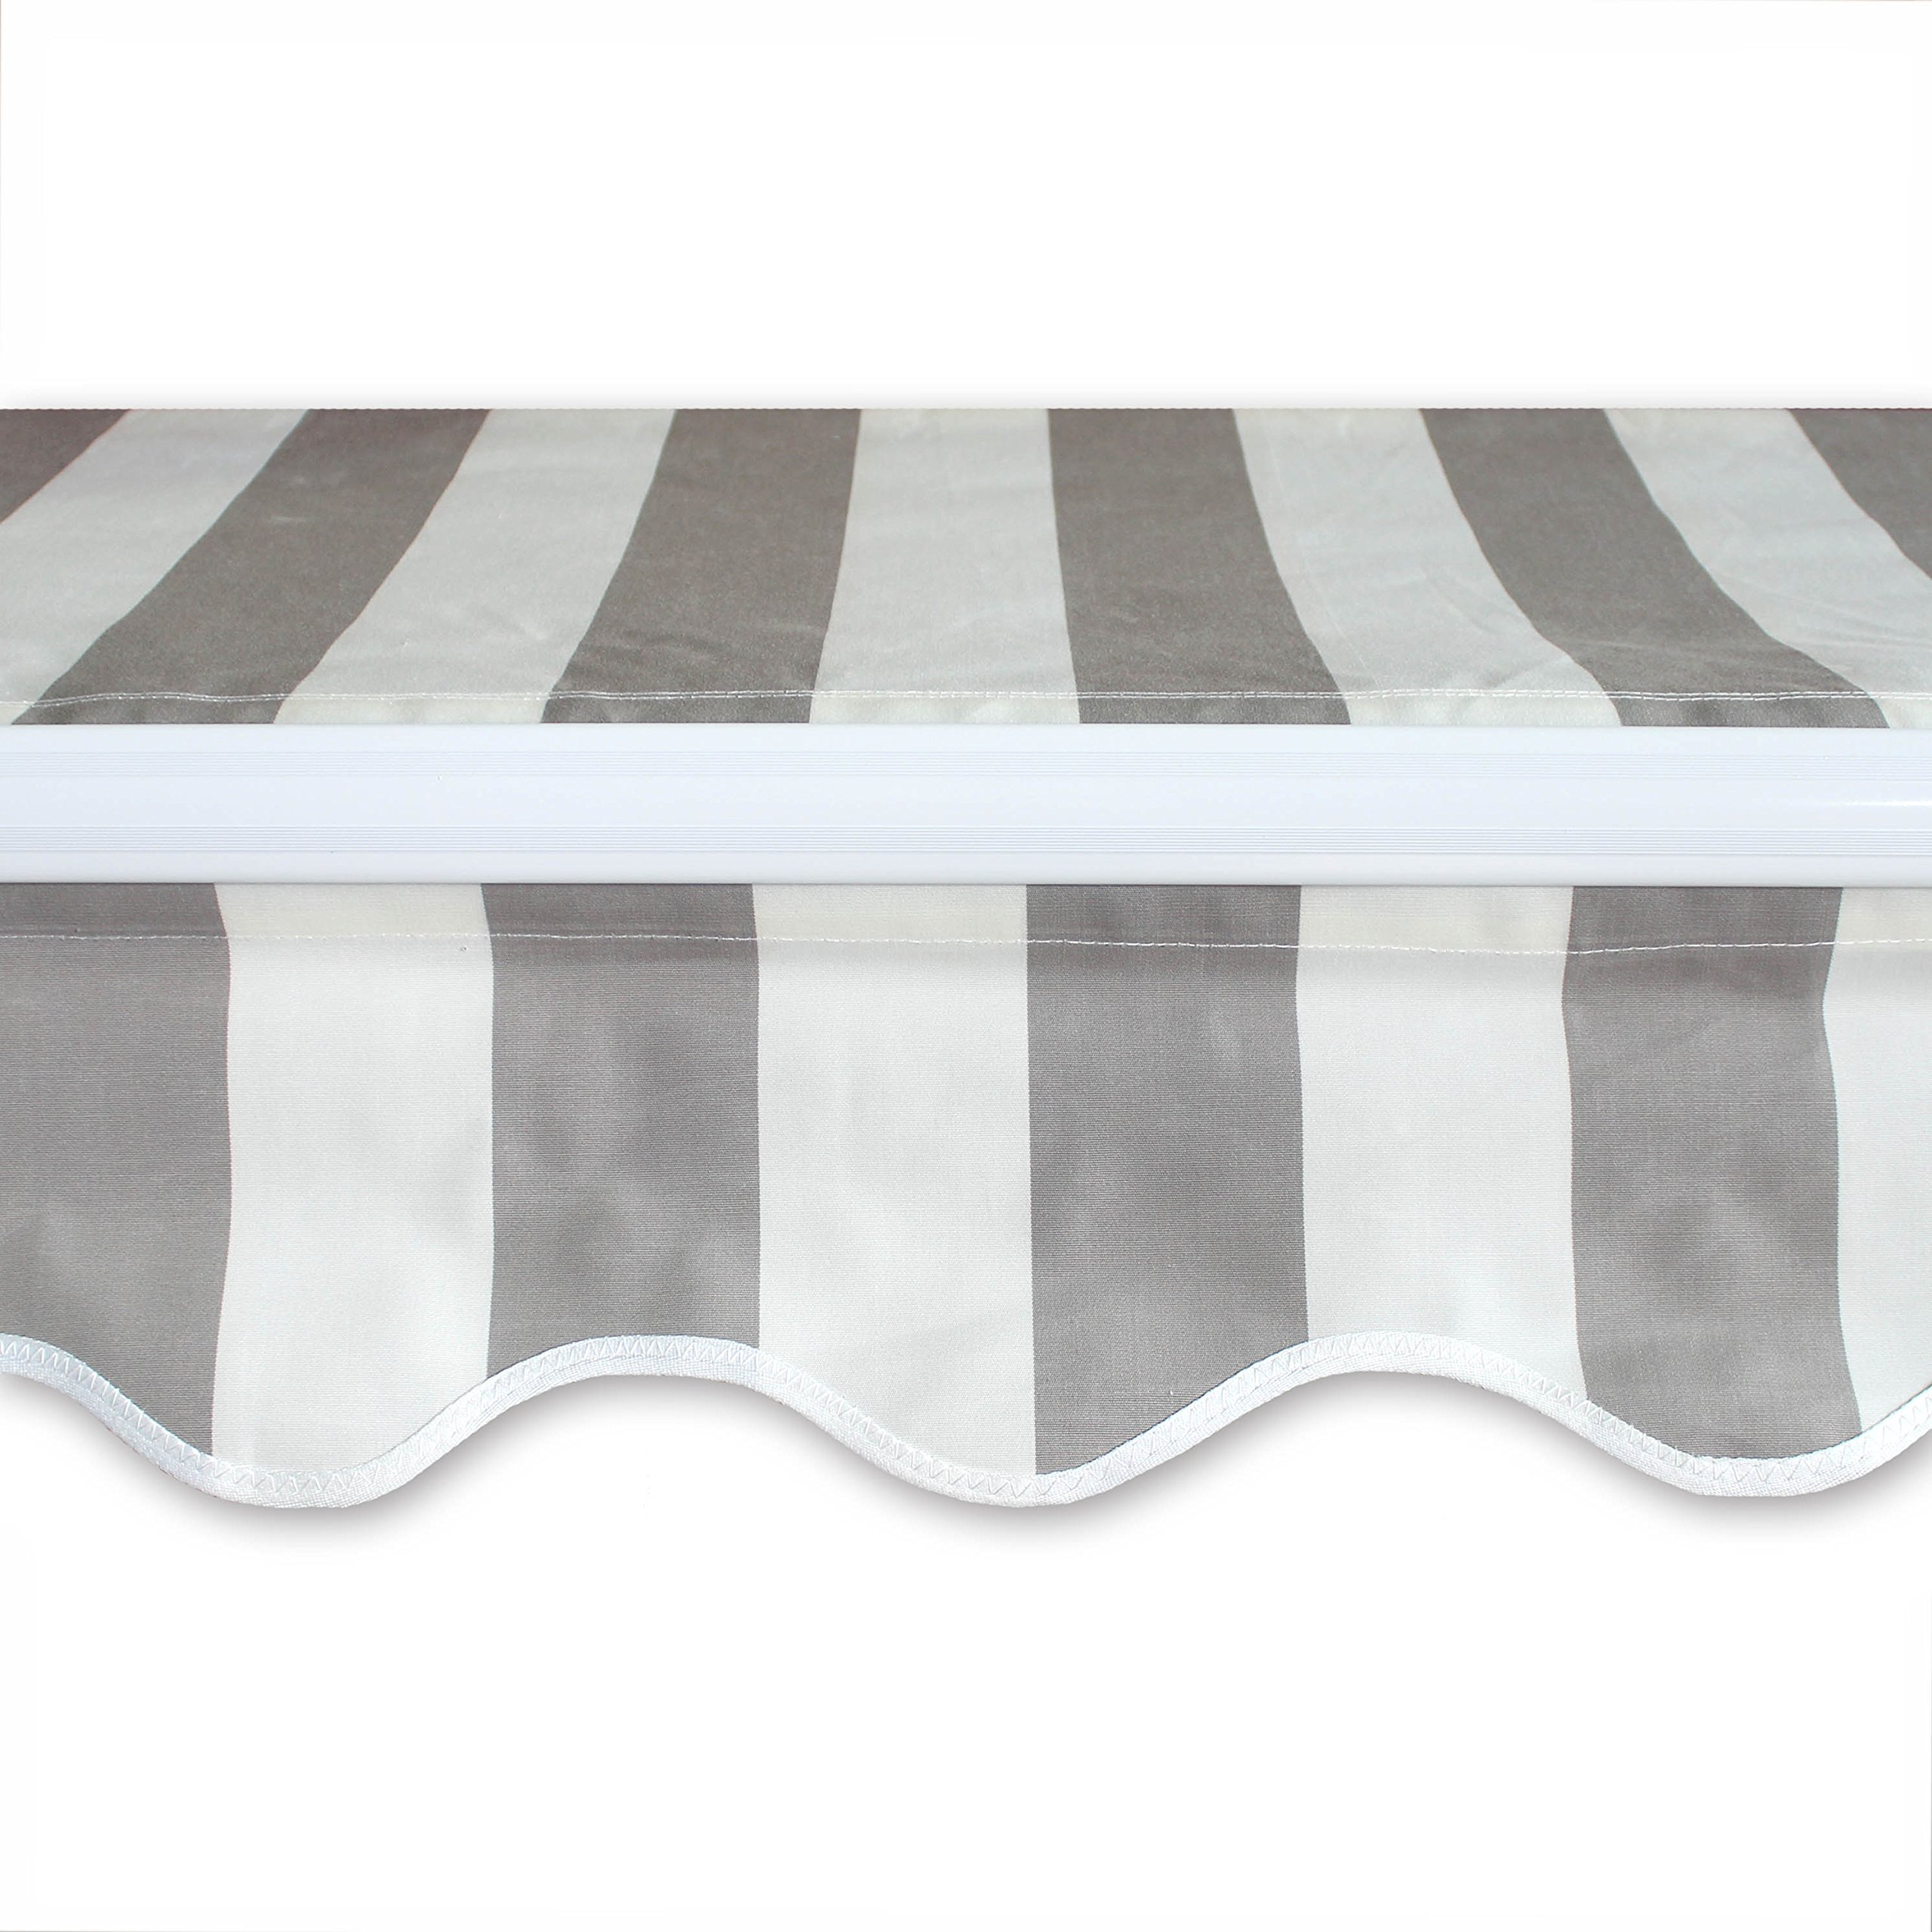 ALEKO AW10X8GREYWHT Retractable Patio Awning 10 x 8 Feet Gray and White Striped